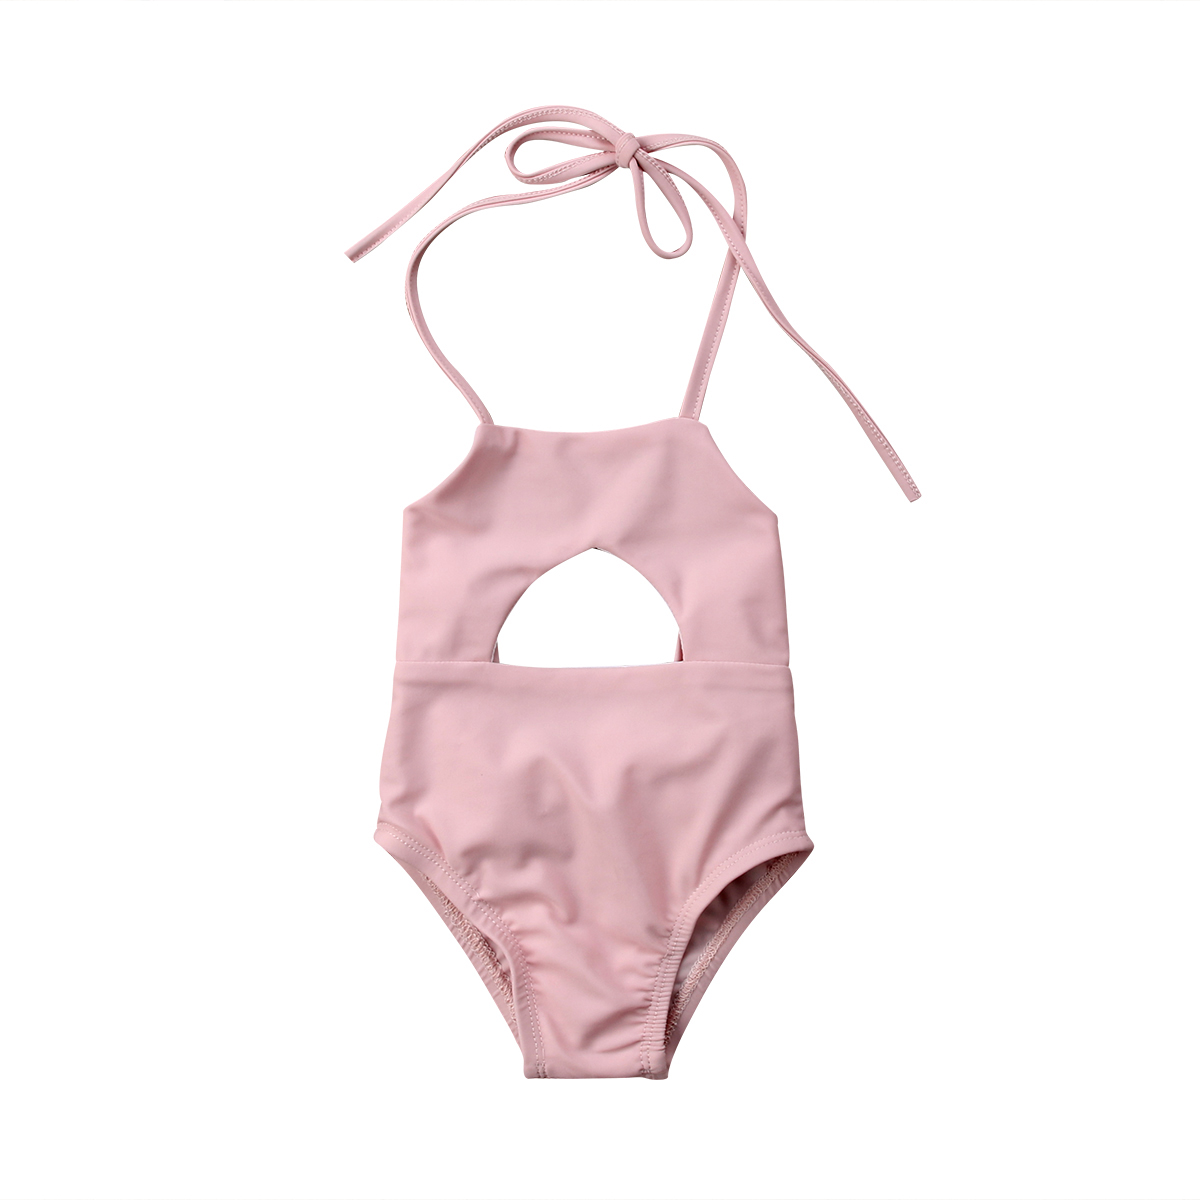 One-piece Newborn Baby Girl Clothes Swimsuit Swimwear Bikini Bathing Suit